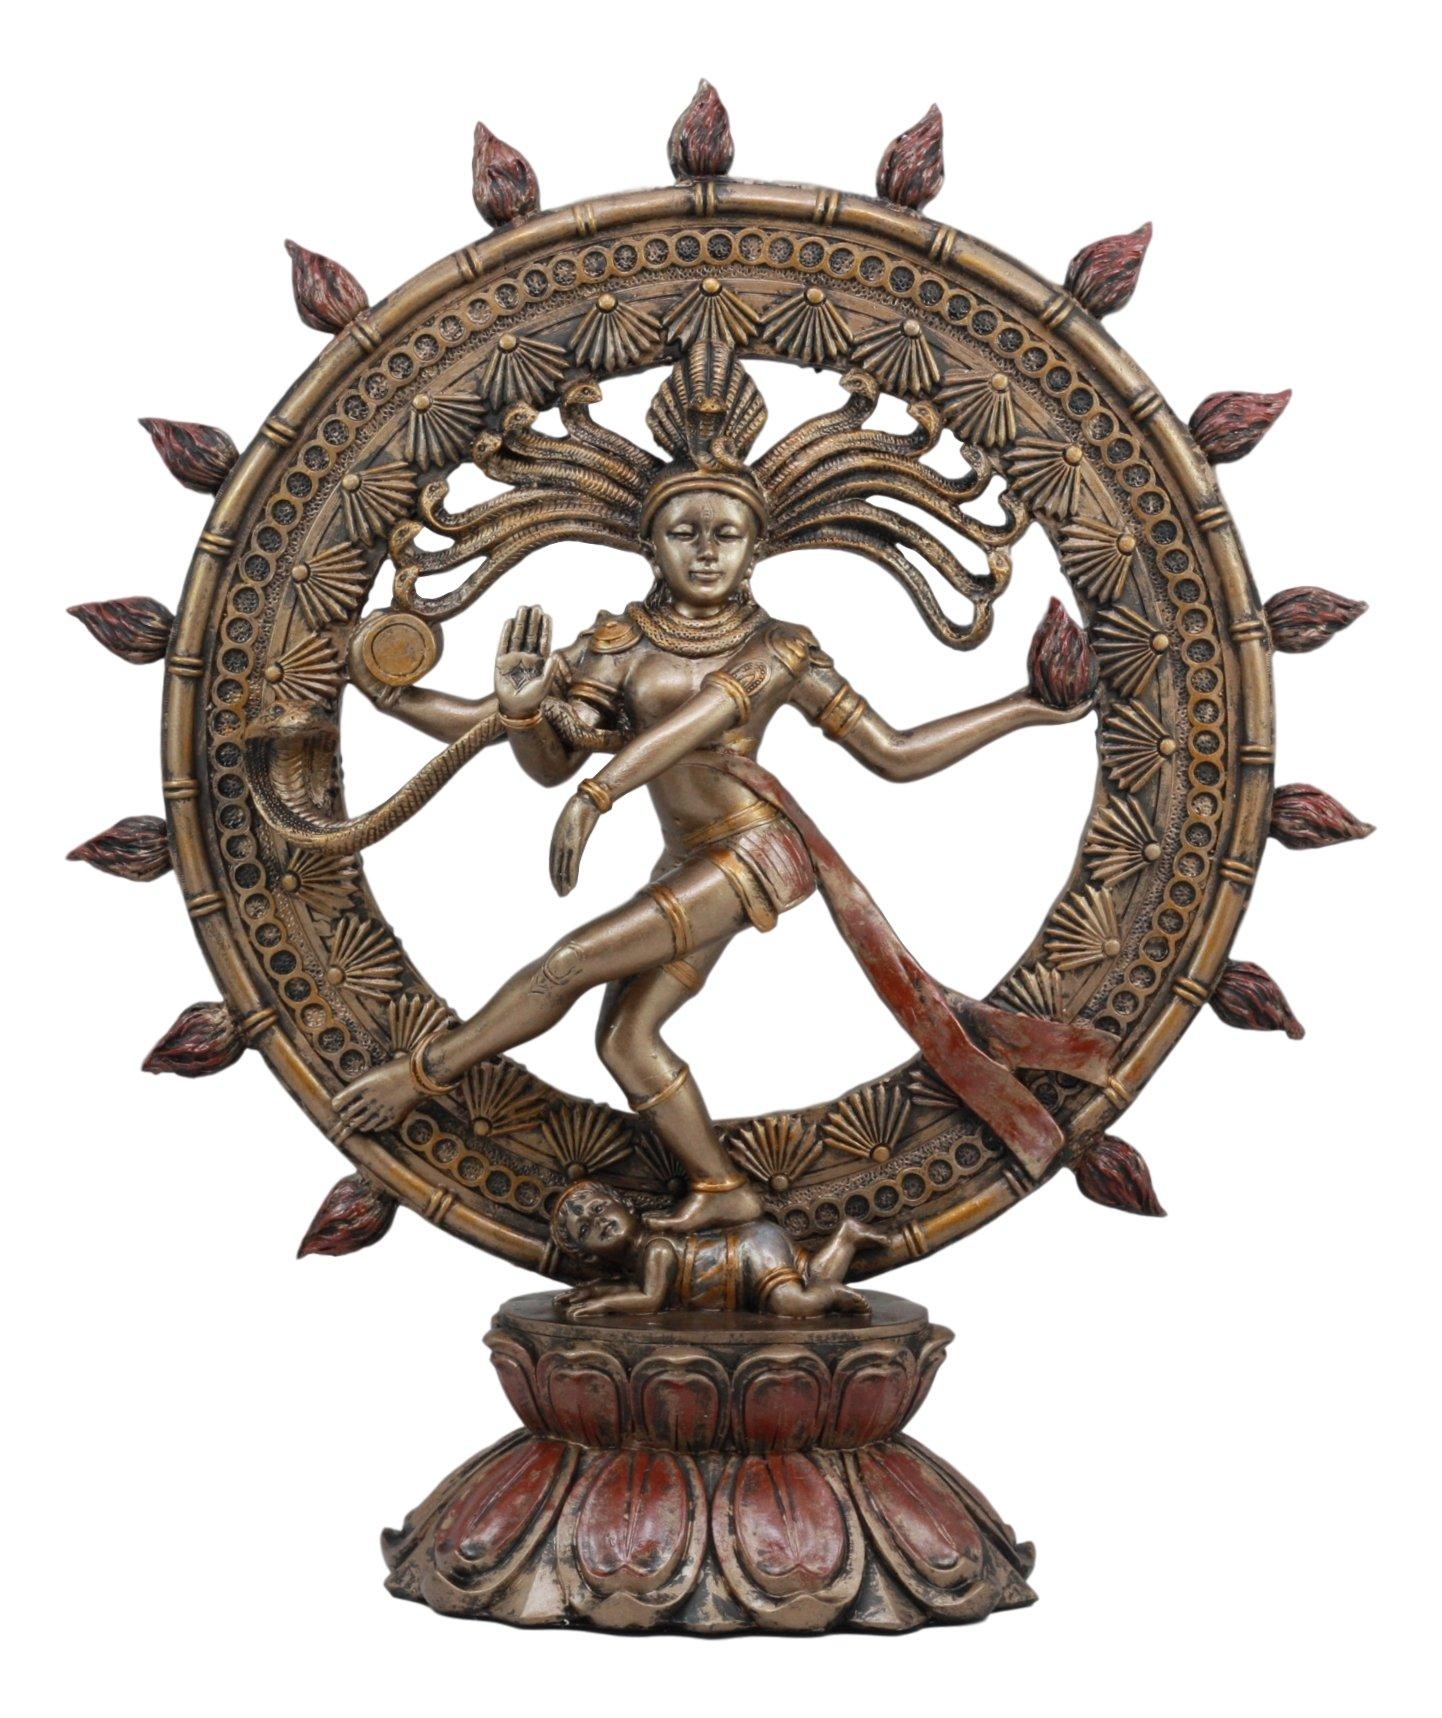 Ebros Large Hindu Supreme God Shiva Nataraja Statue 15''Tall Cosmic Divine Dancer Tandava Sabesan Liberator of Souls Eastern Enlightenment